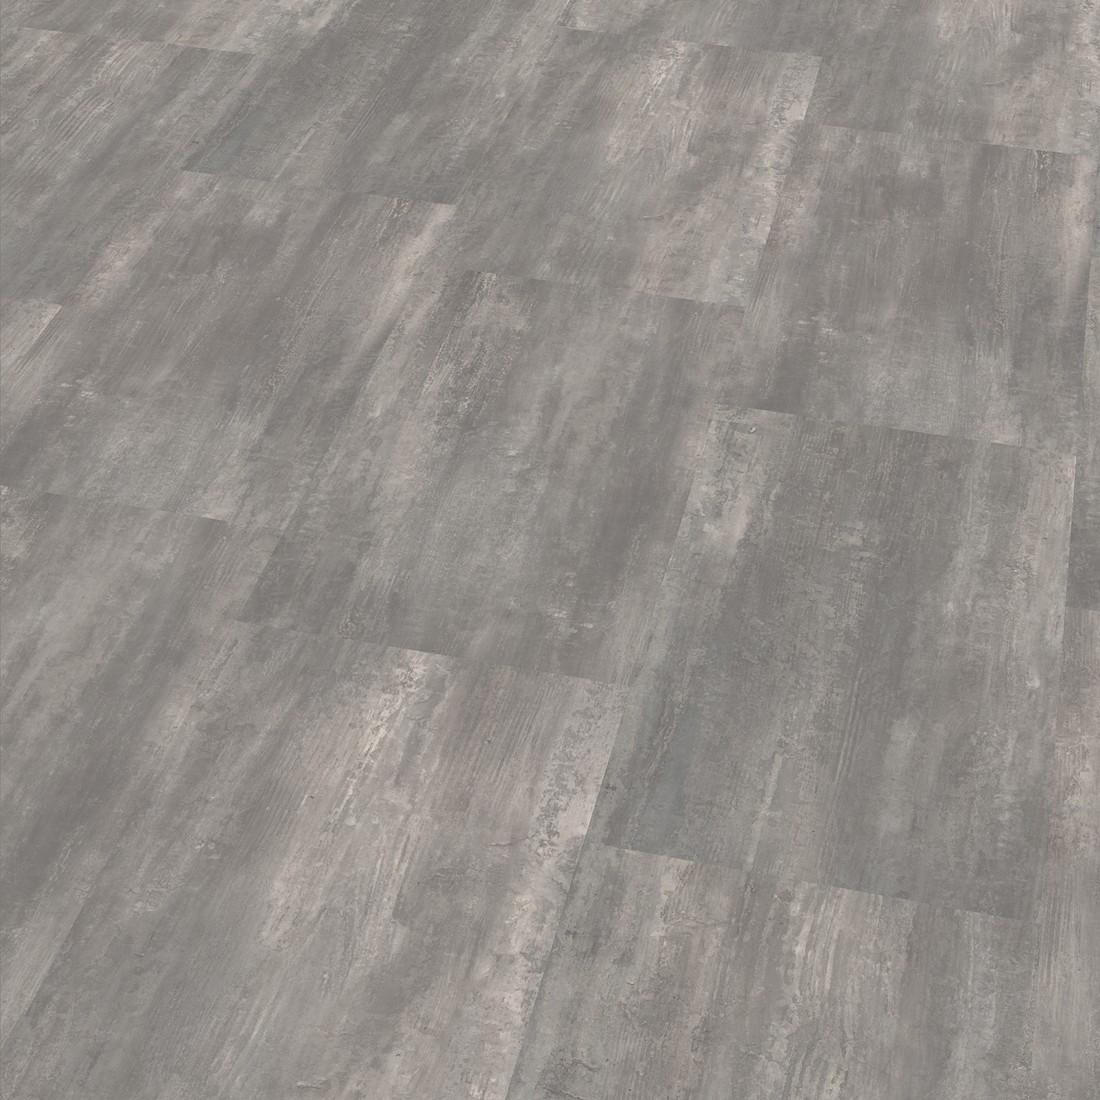 laminat berlin reparatur laminat with laminat berlin. Black Bedroom Furniture Sets. Home Design Ideas